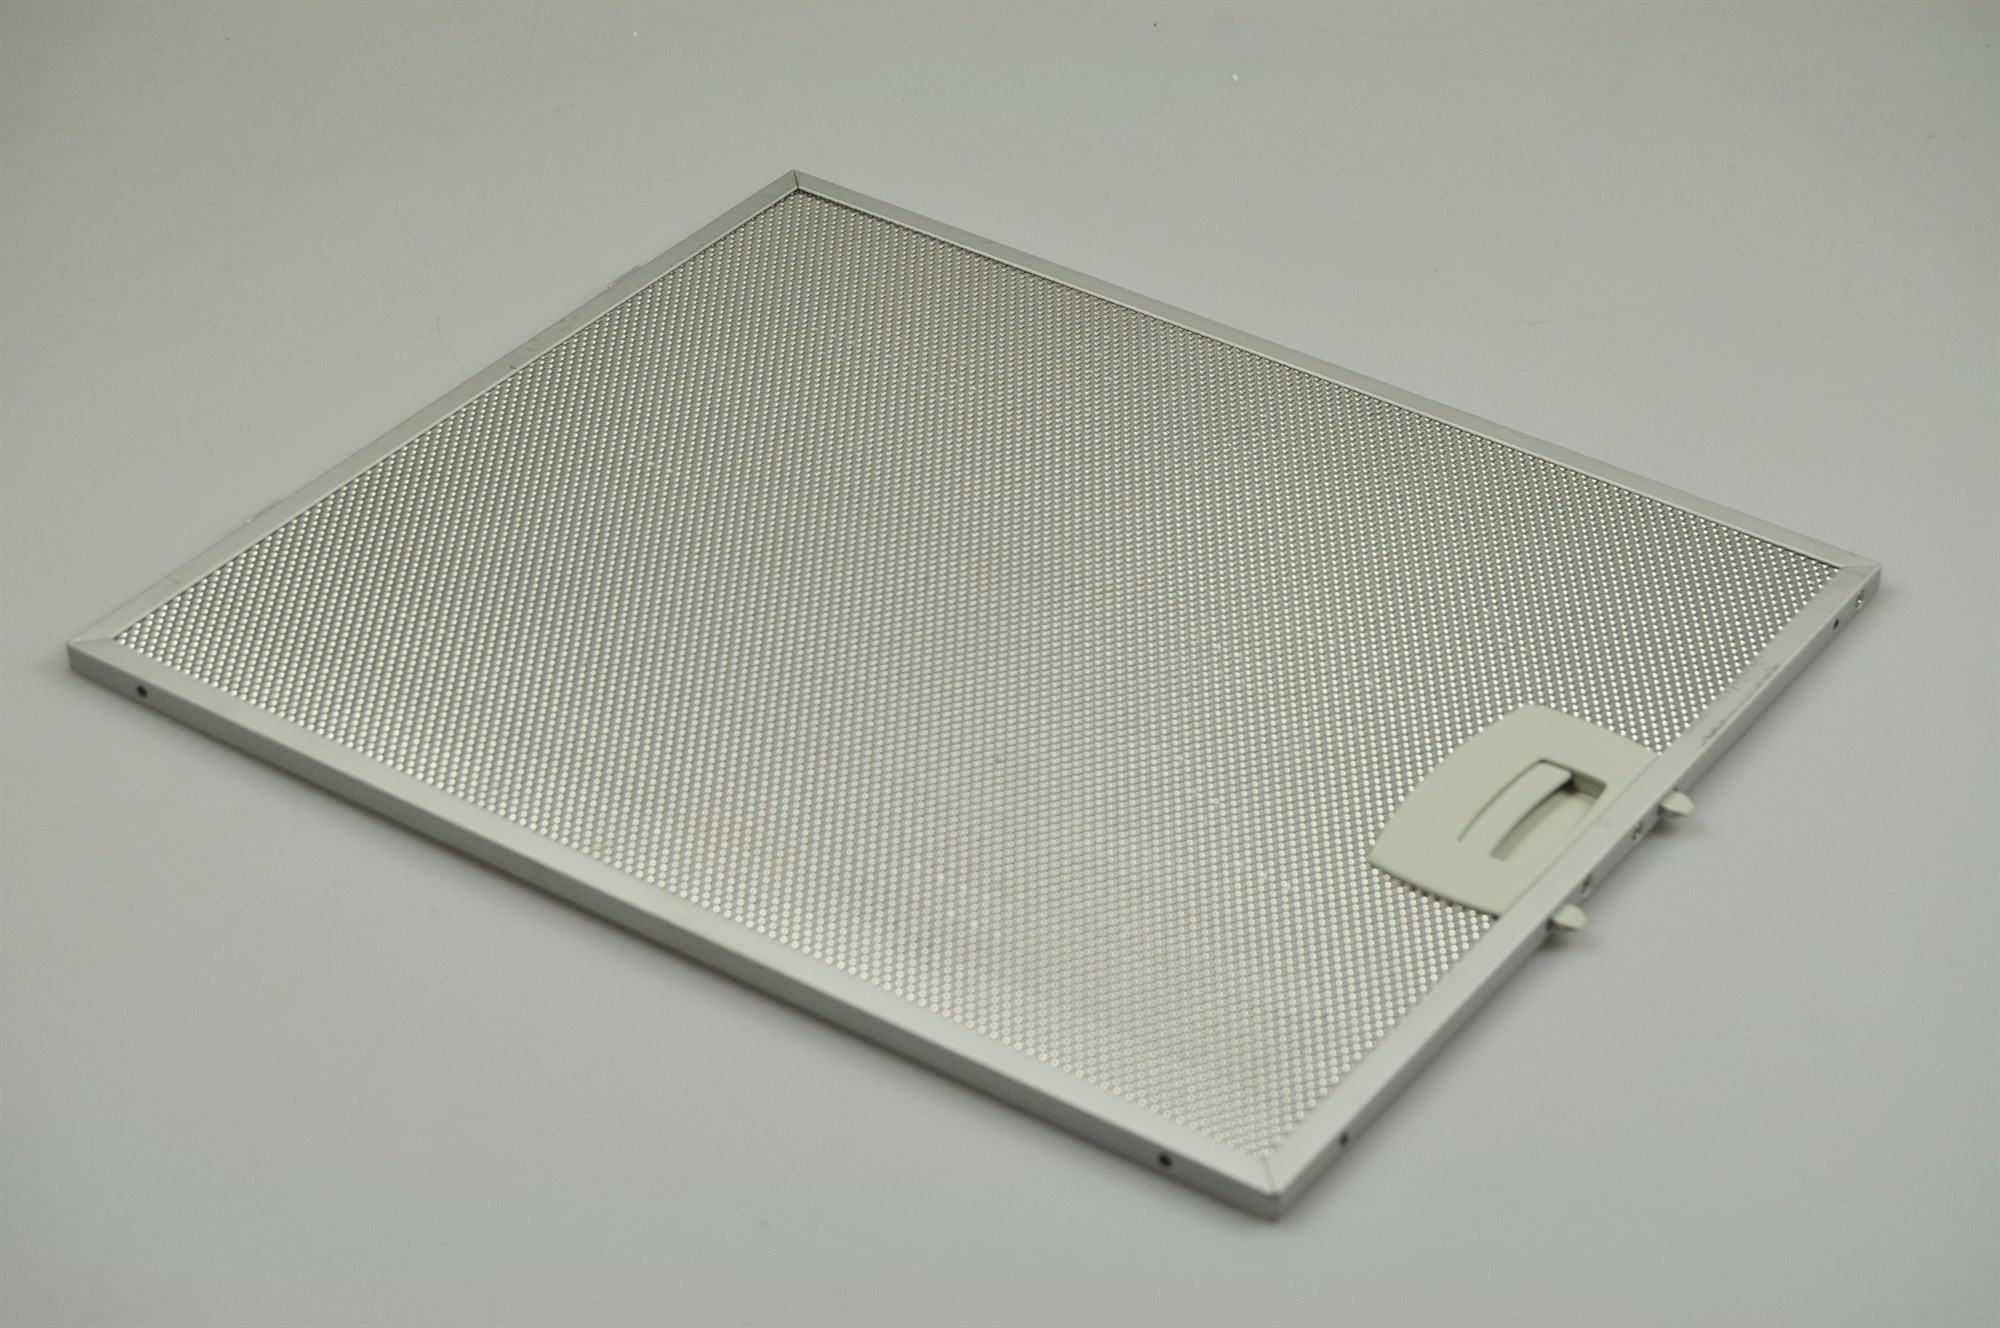 metallfilter silverline dunstabzugshaube 8 mm x 337 mm x 283 mm. Black Bedroom Furniture Sets. Home Design Ideas